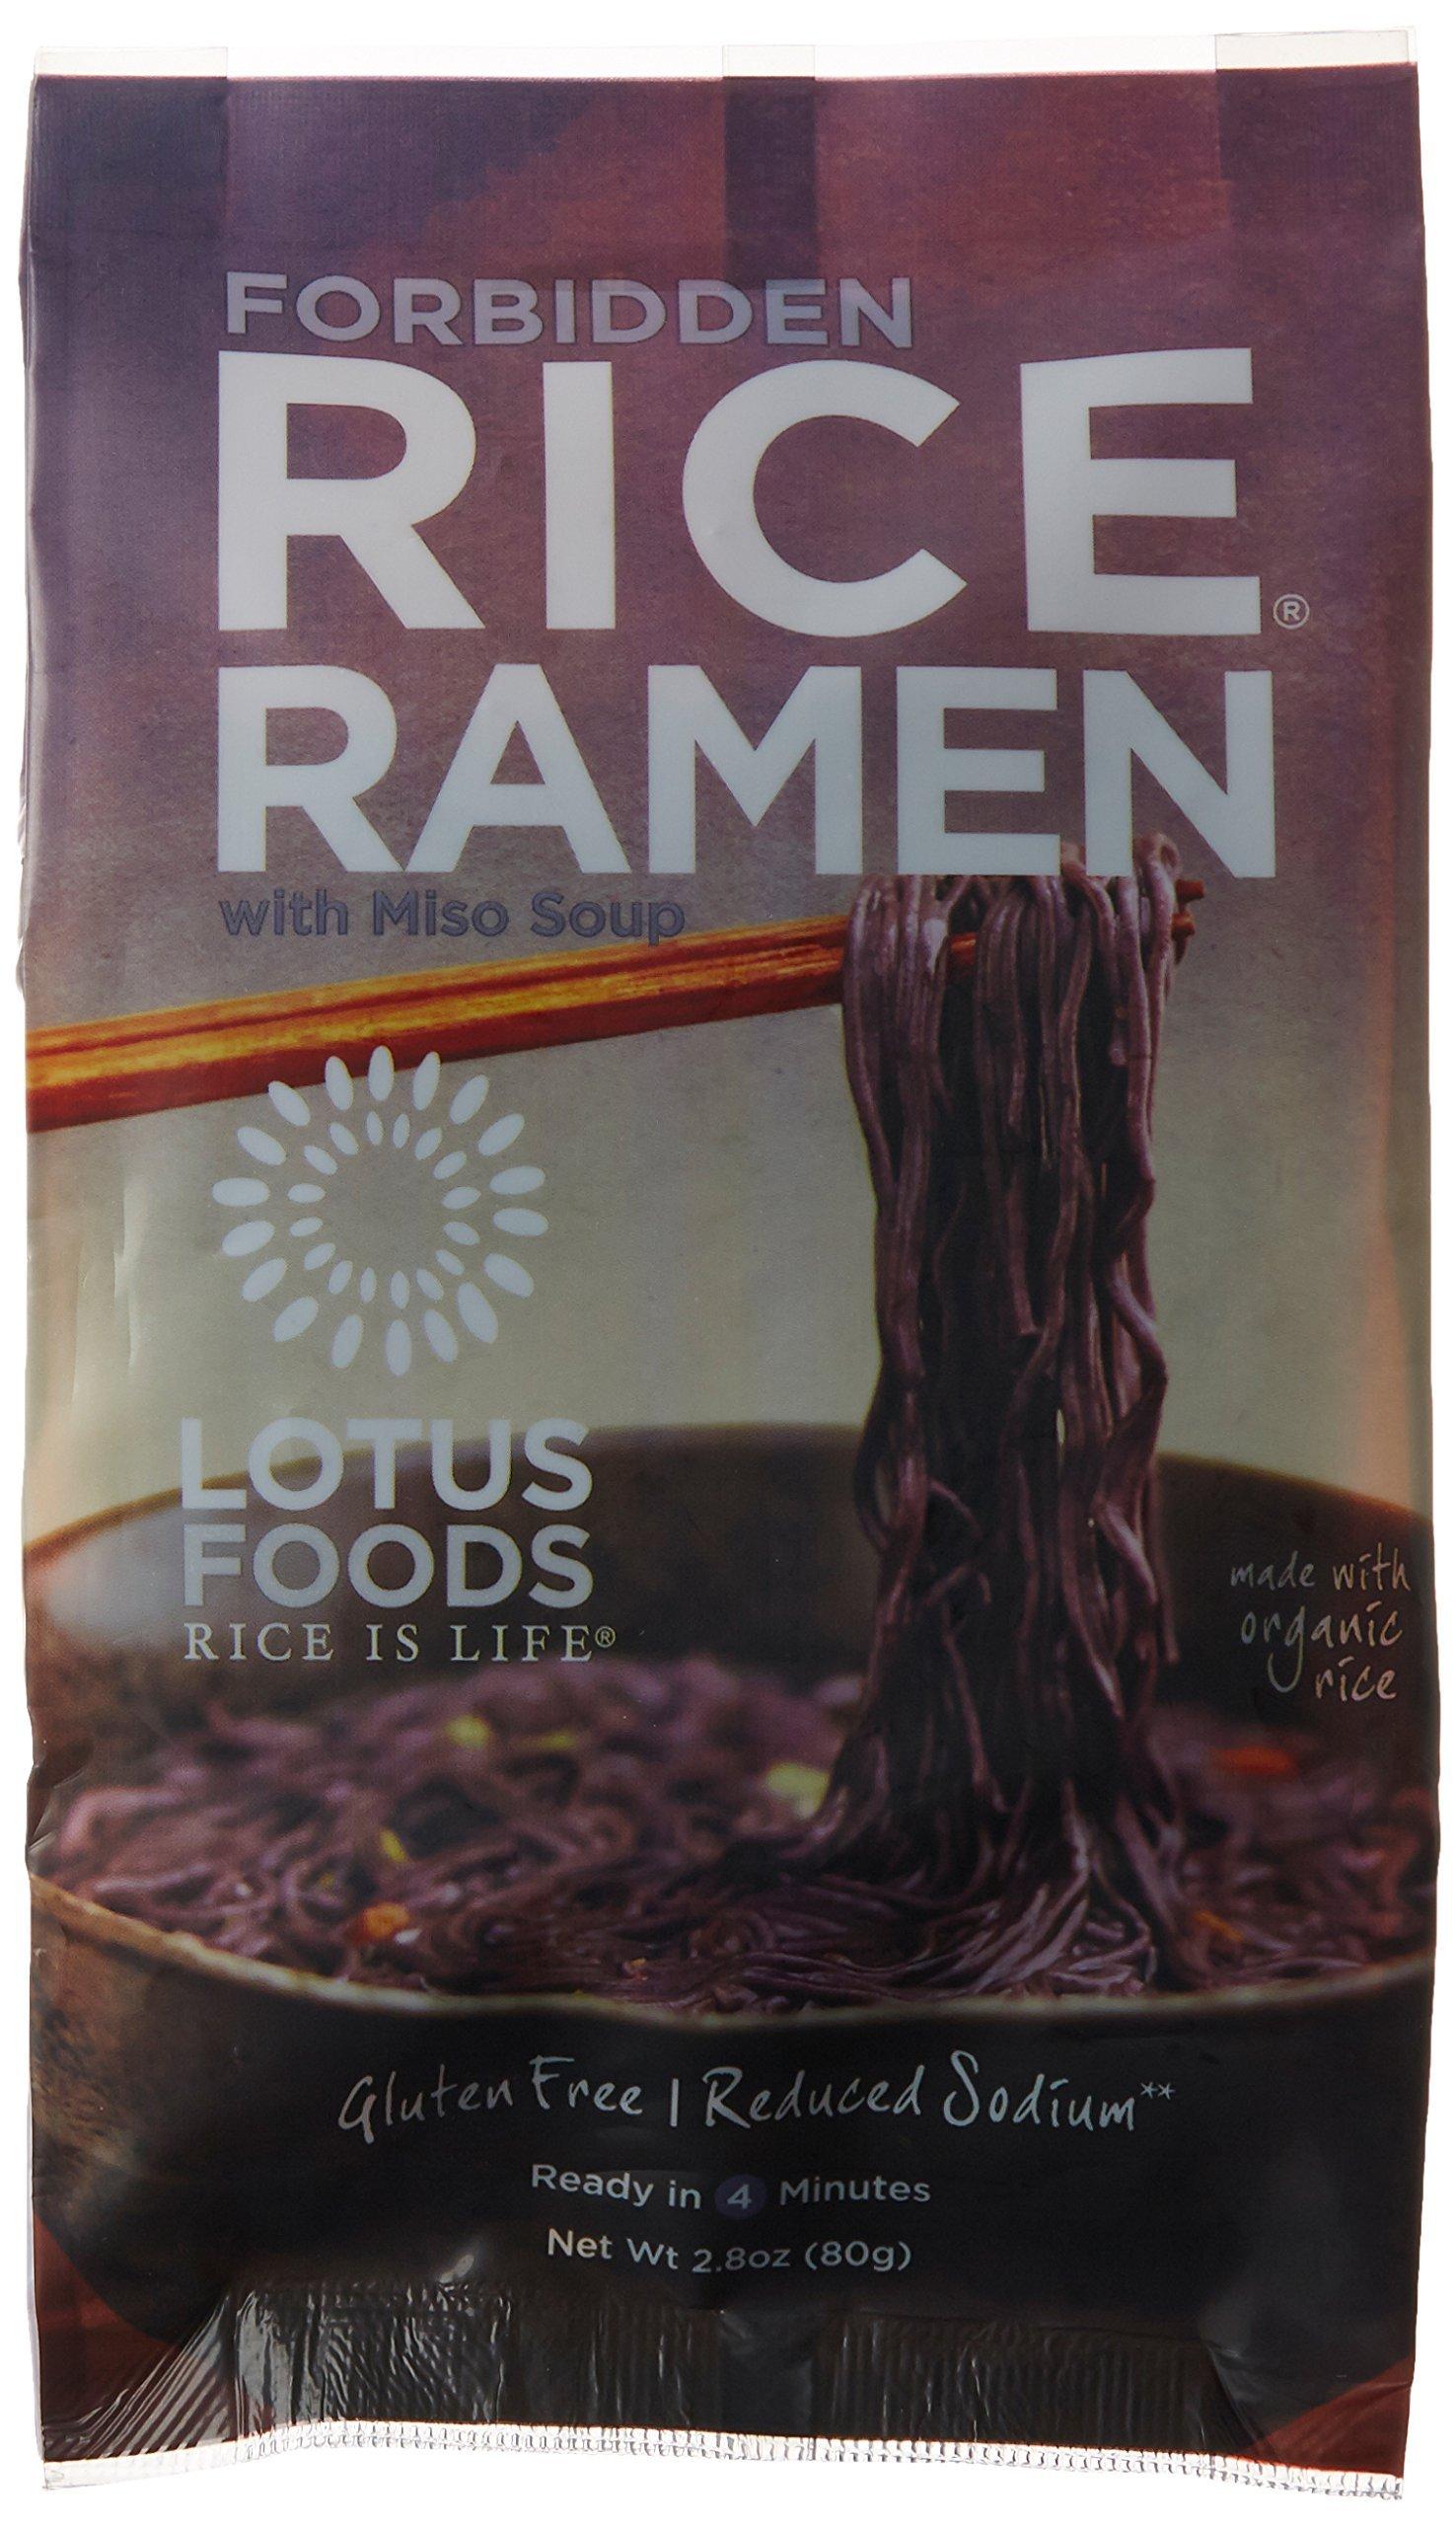 Lotus Foods Forbidden Rice Ramen with Miso Soup, 2.8 oz